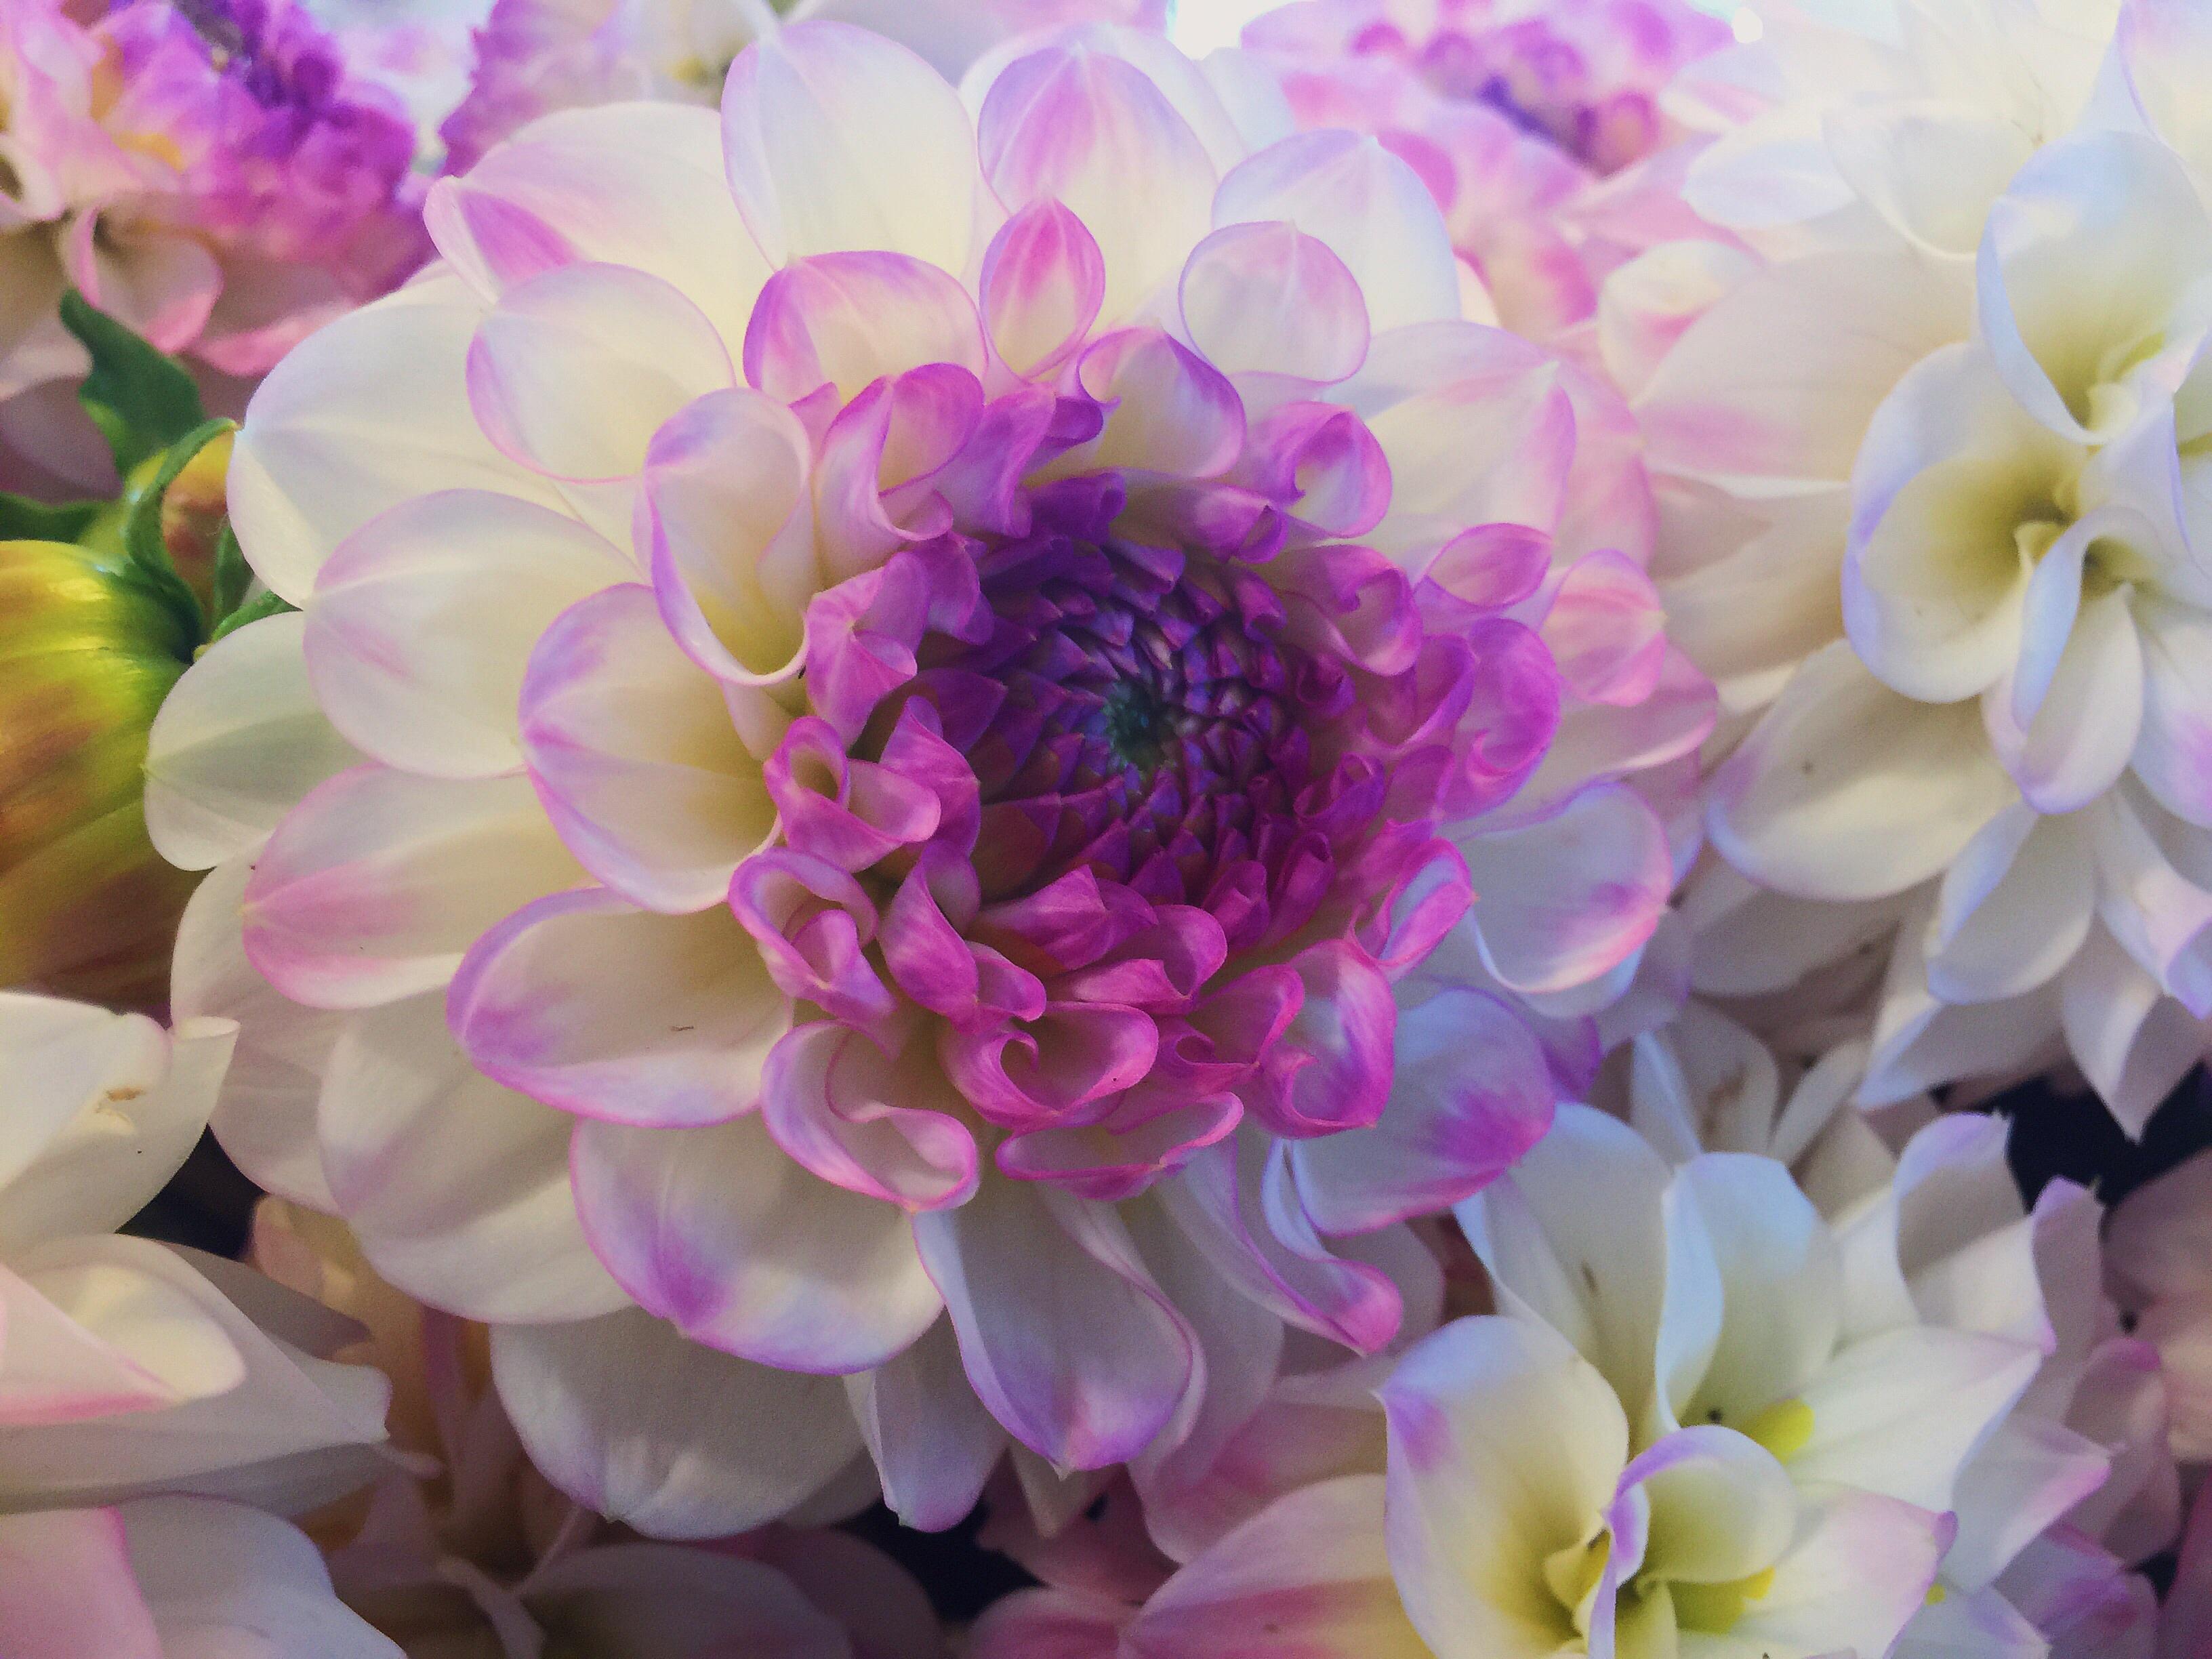 Free Images Nature Blossom Purple Petal Bloom Pink Flora